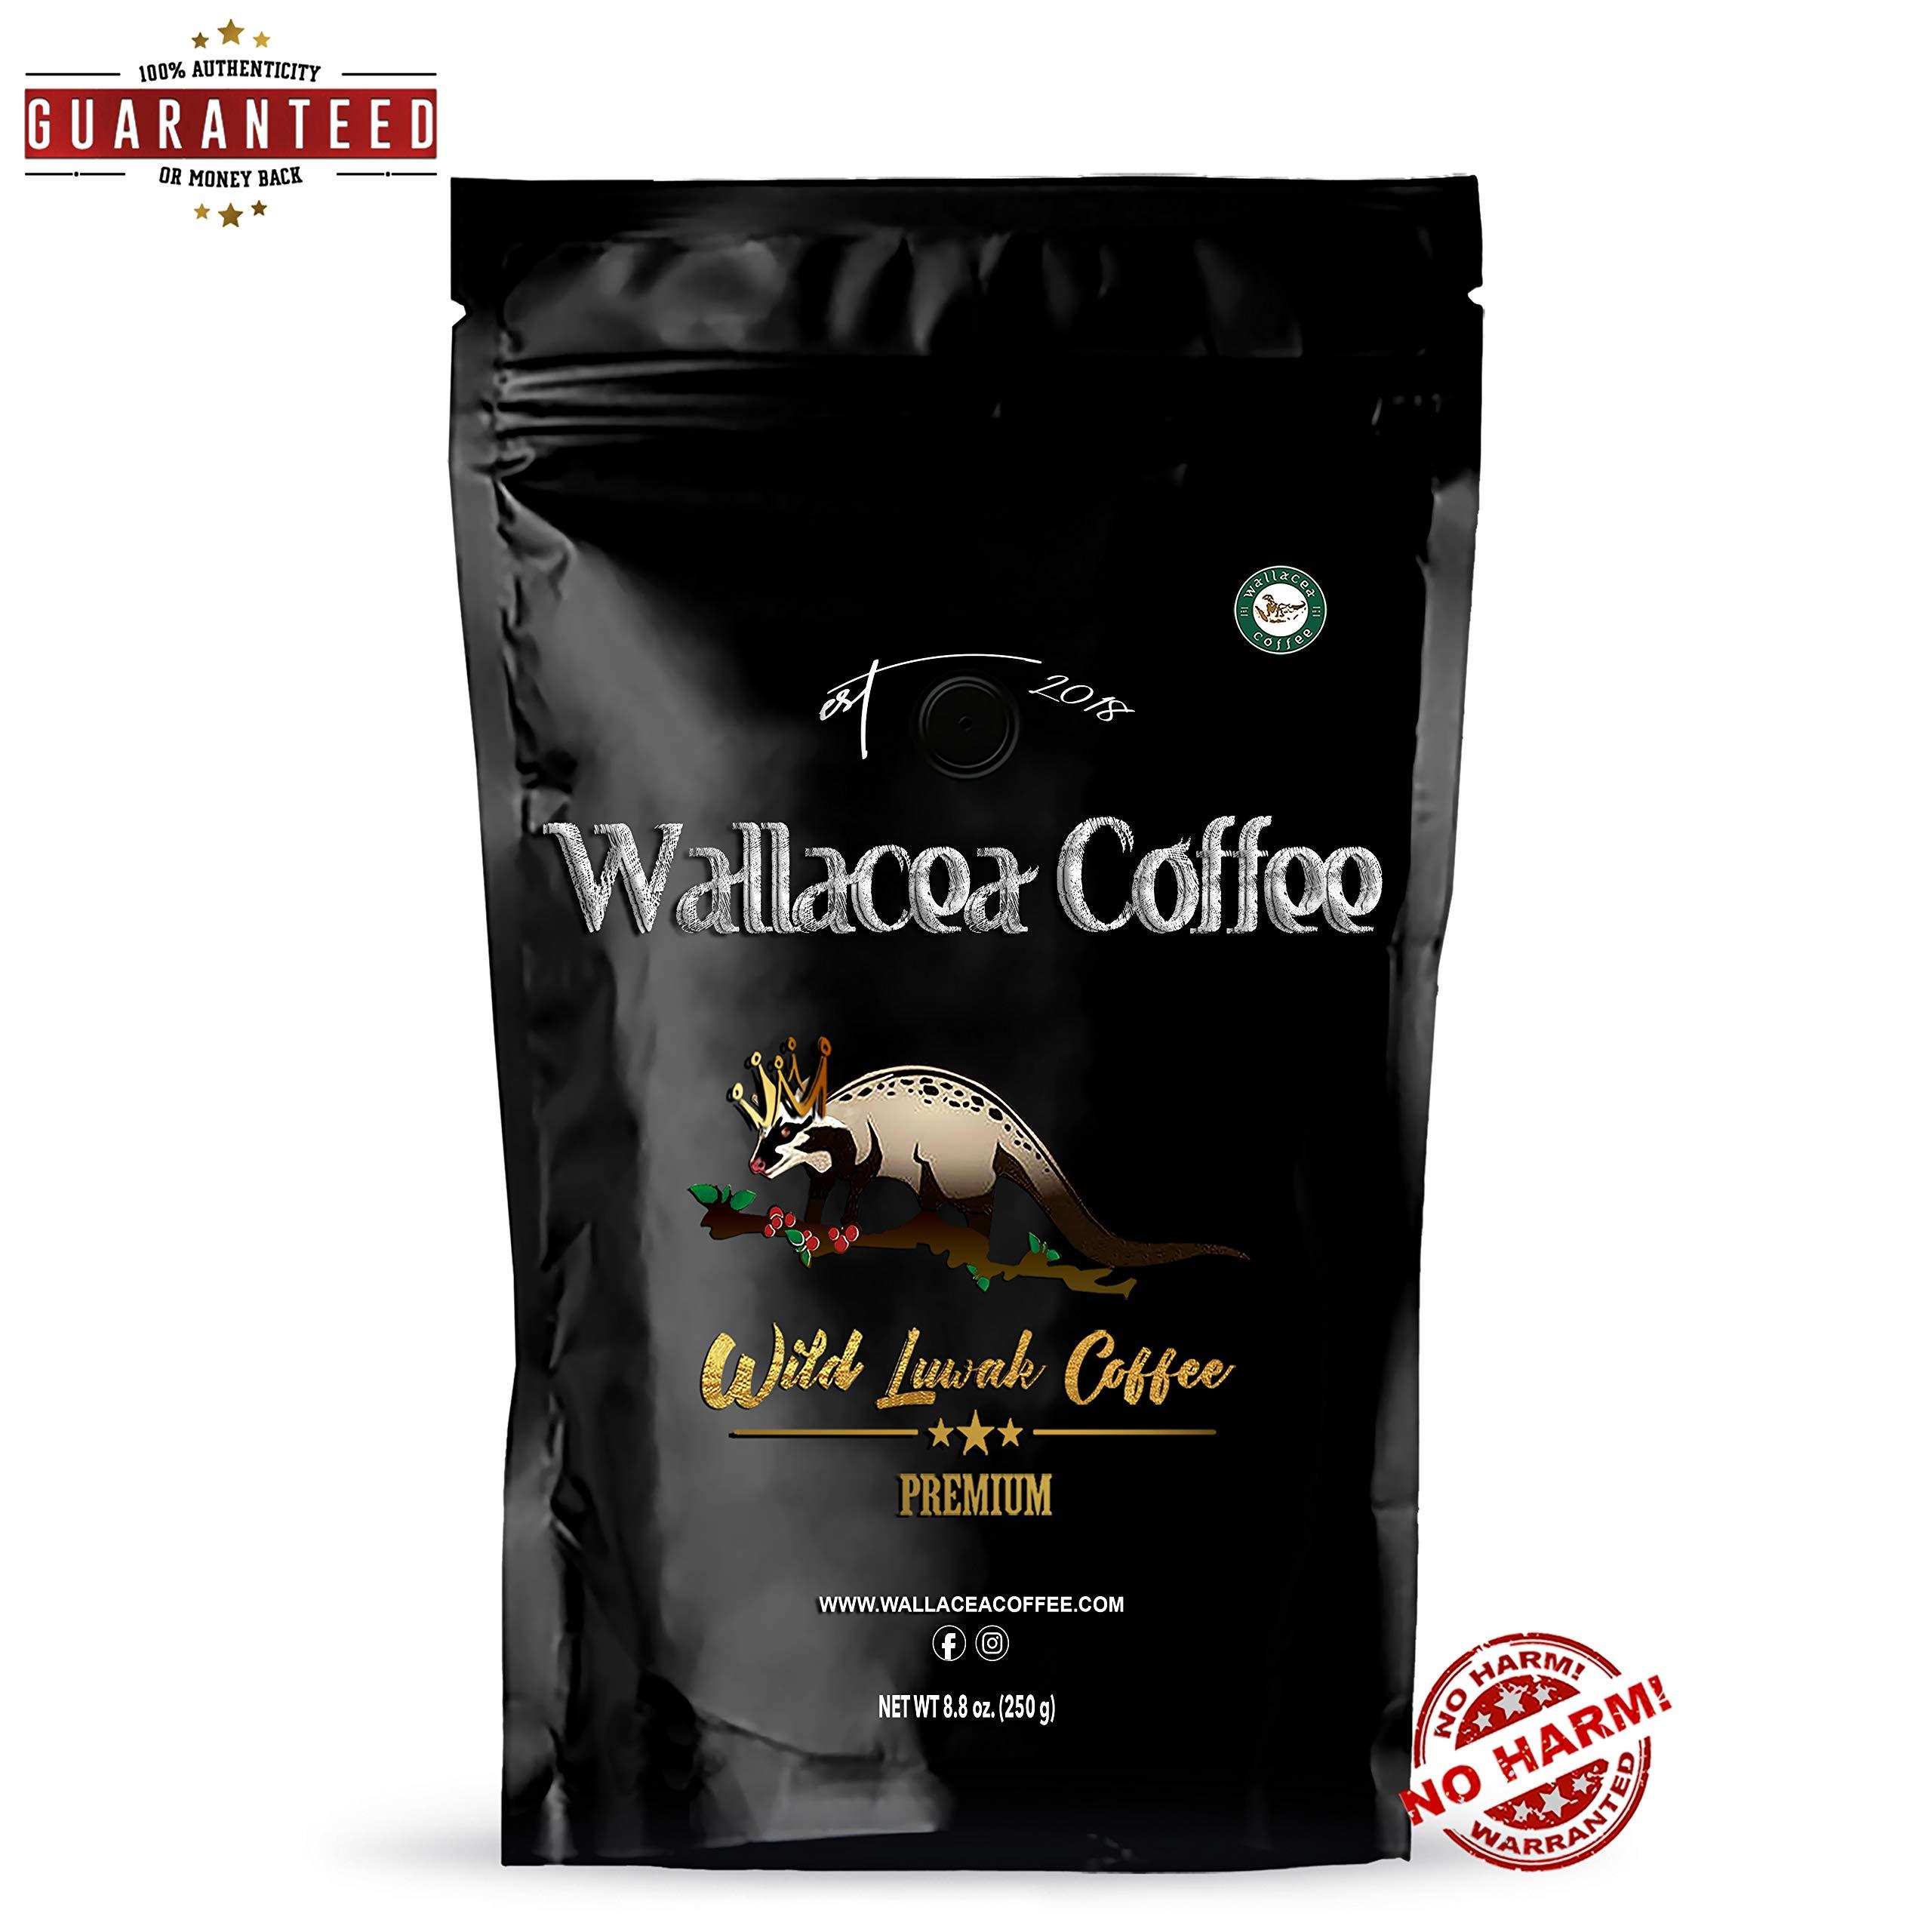 Wallacea Coffee Wild Kopi Luwak Coffee Beans, Gayo Sumatra Indonesia, 250 grams (8.8 oz) by Wallacea Coffee